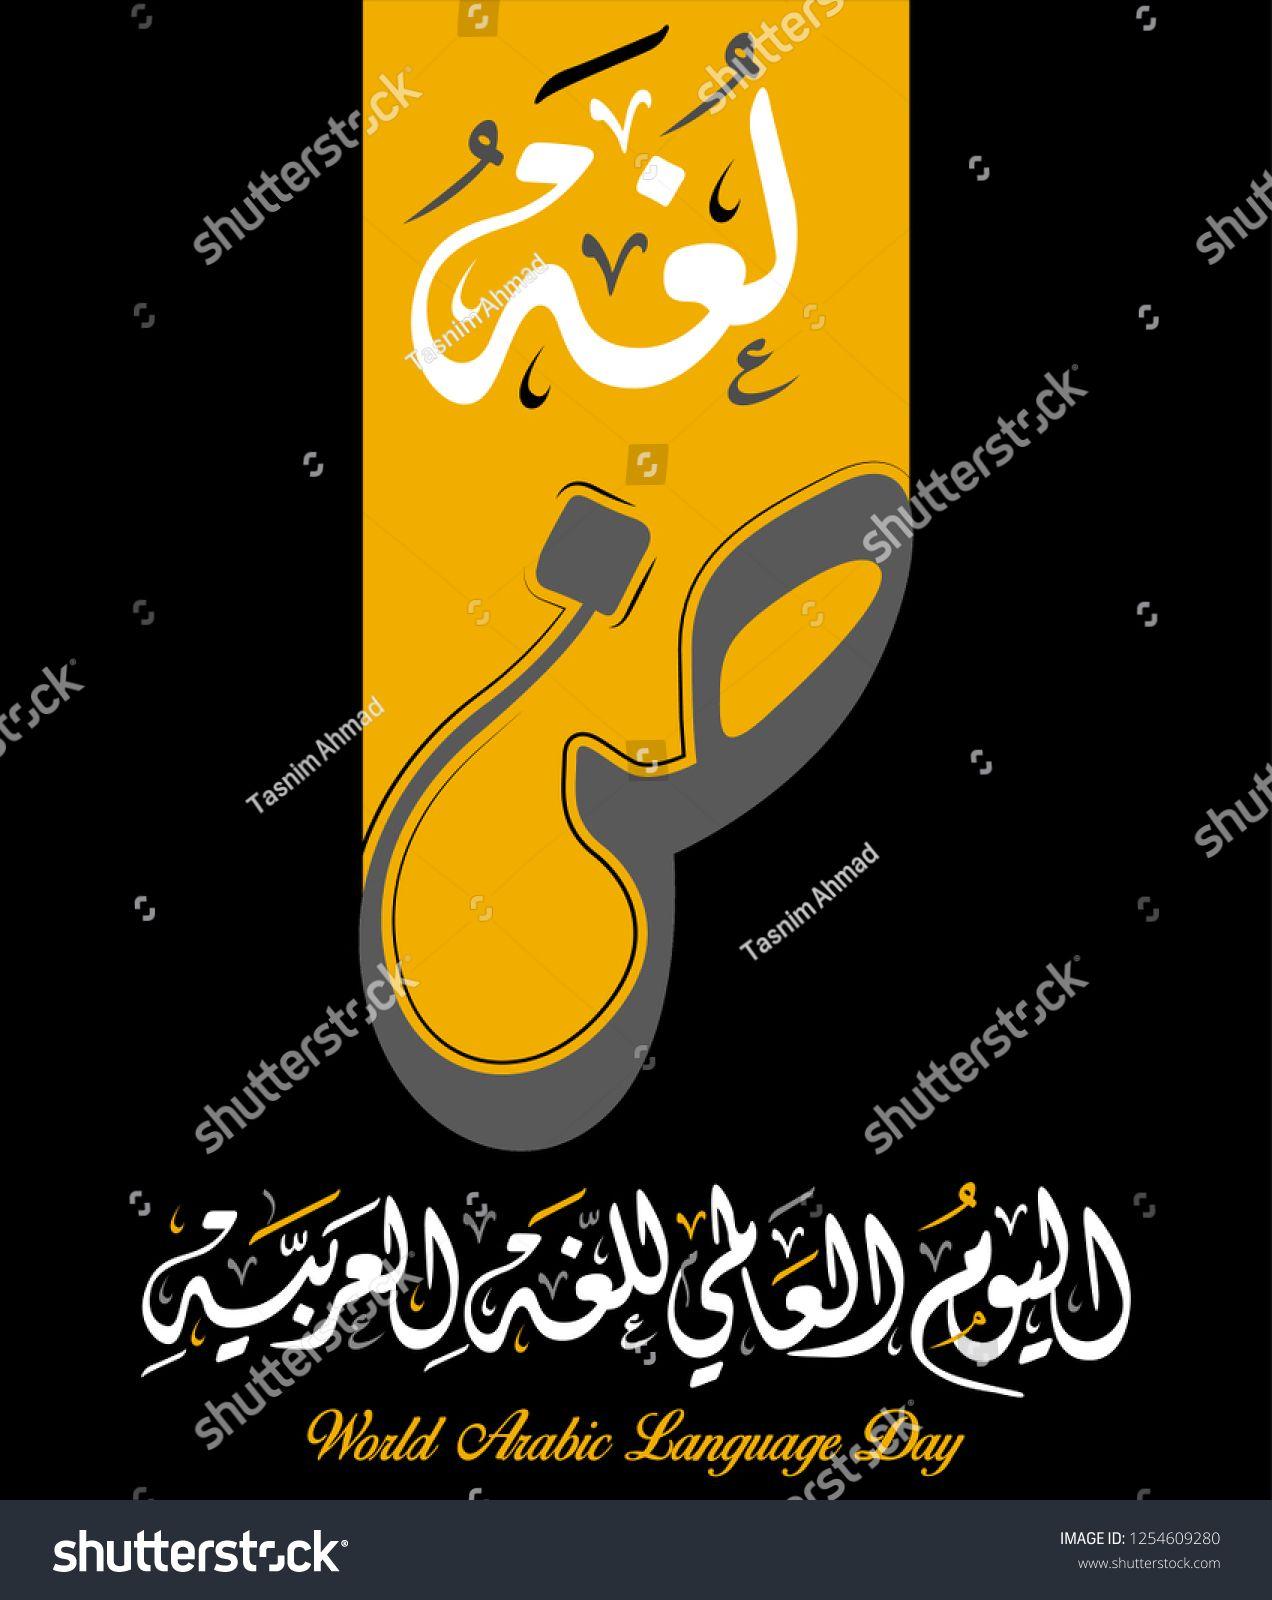 International Language Day Logo In Arabic Calligraphy Design Arabic Language Day Greet International Language Day Calligraphy Design Arabic Calligraphy Design